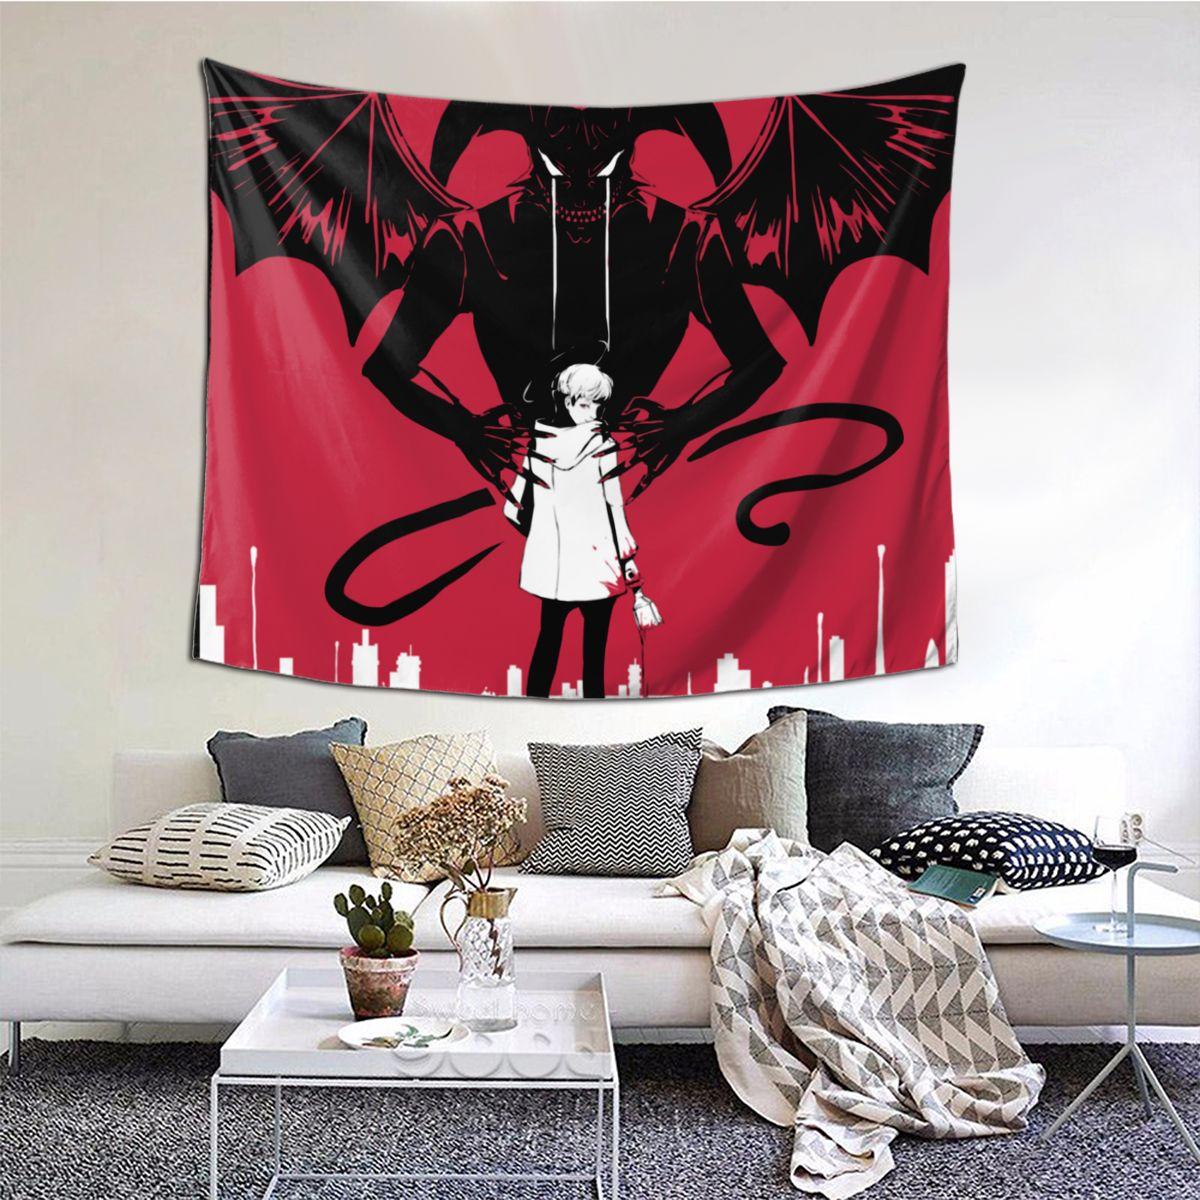 Devilman-نسيج حائط كريبيبي ، ديكور حائط بوليستر ، أكيرا ديفيل ريو ، أنيمي ، رعب ، مانغا ، ديكور منزلي